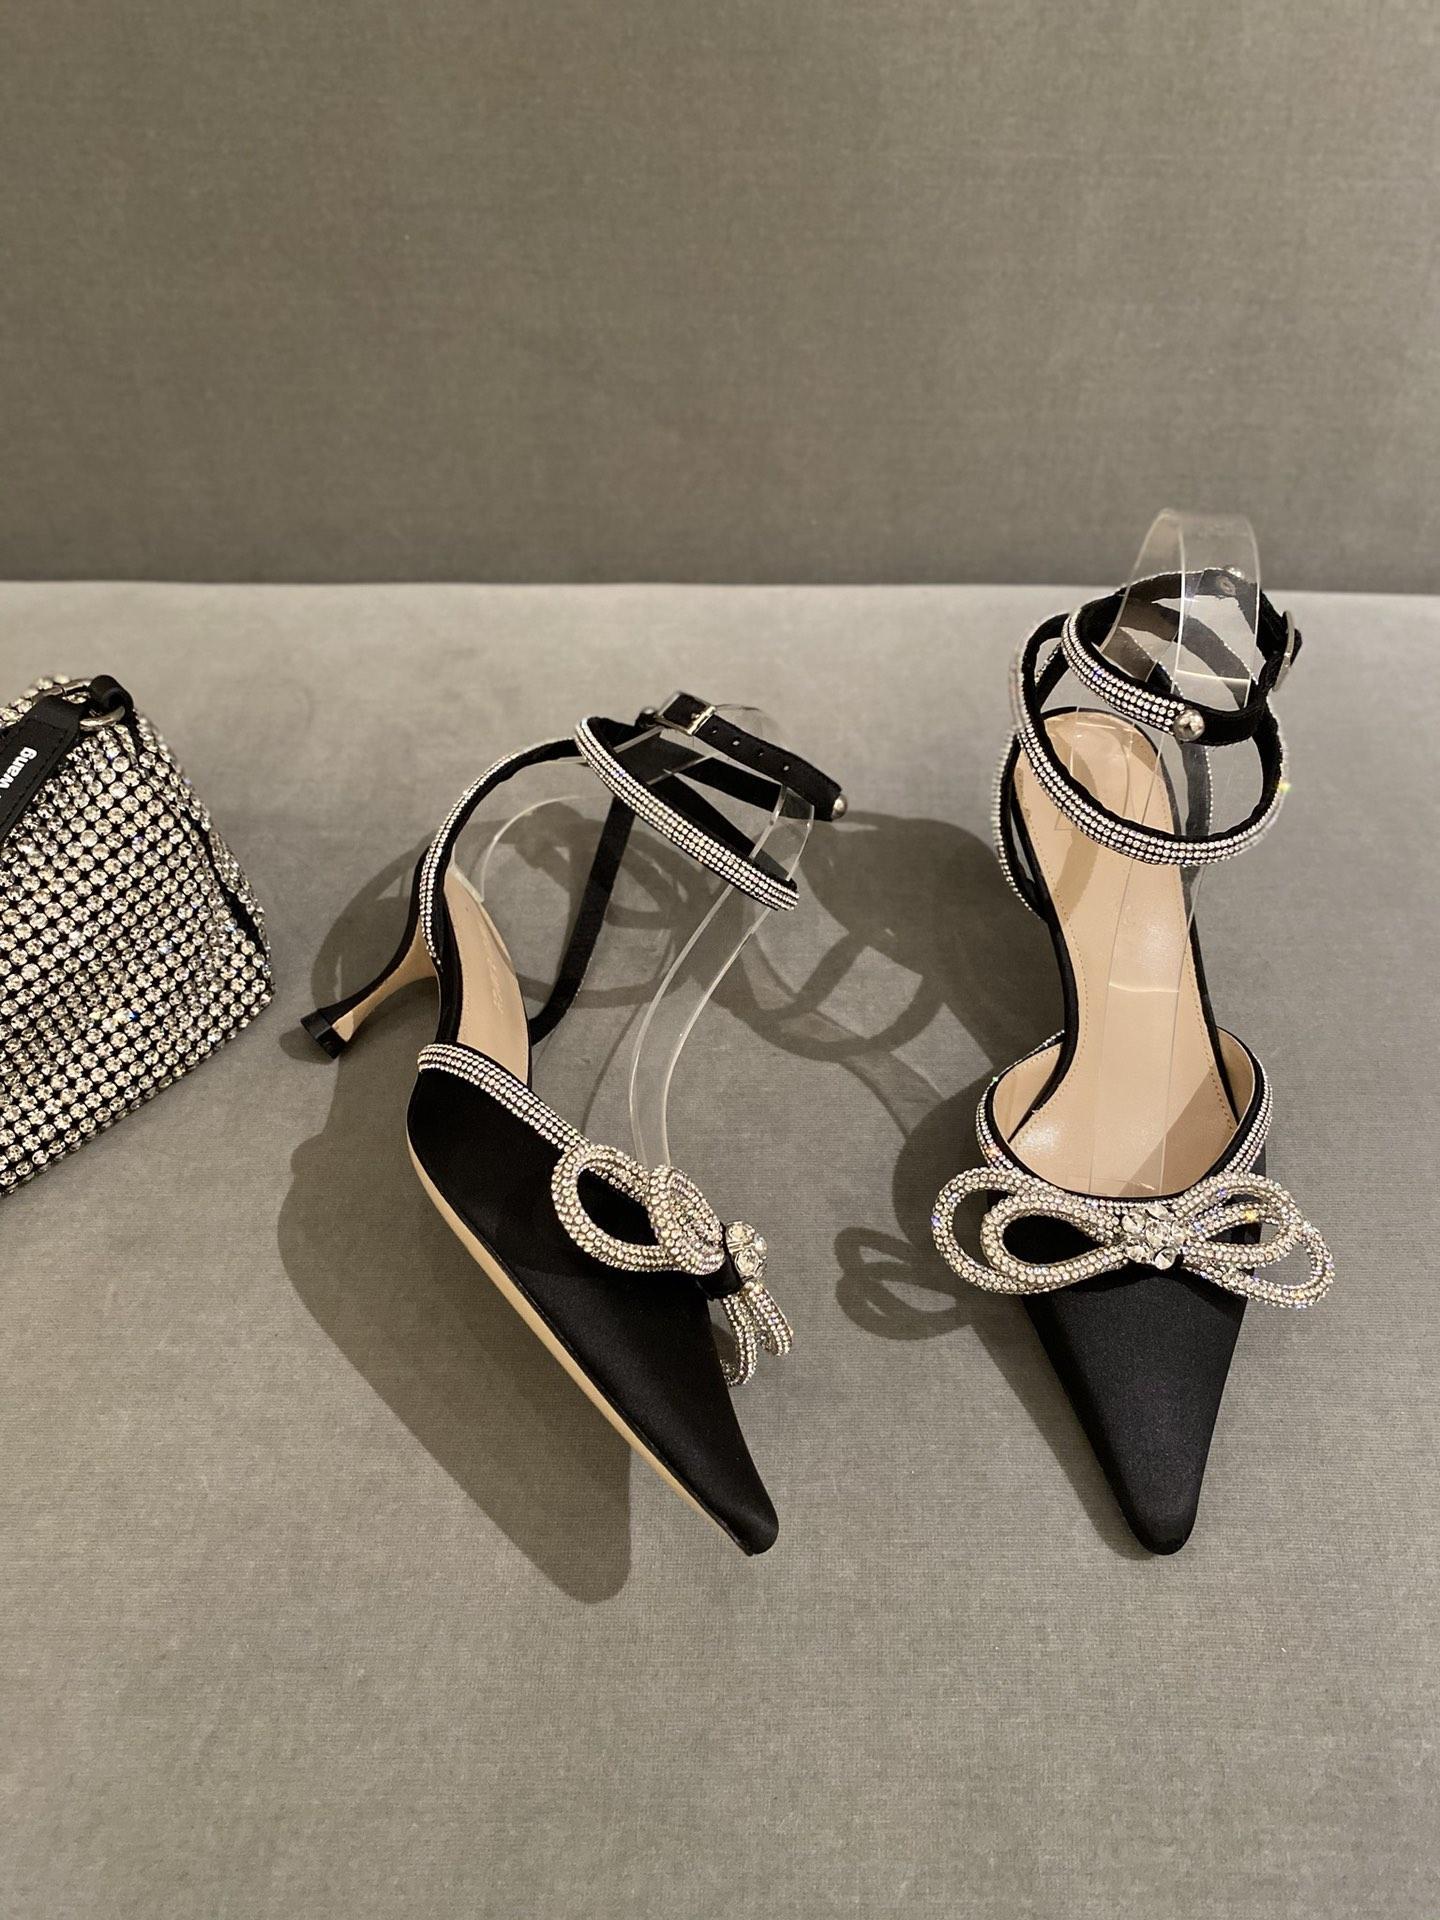 Amina Muaddi Plexi Phoenix Slingback Pumps party sandals women pvc shoes 14